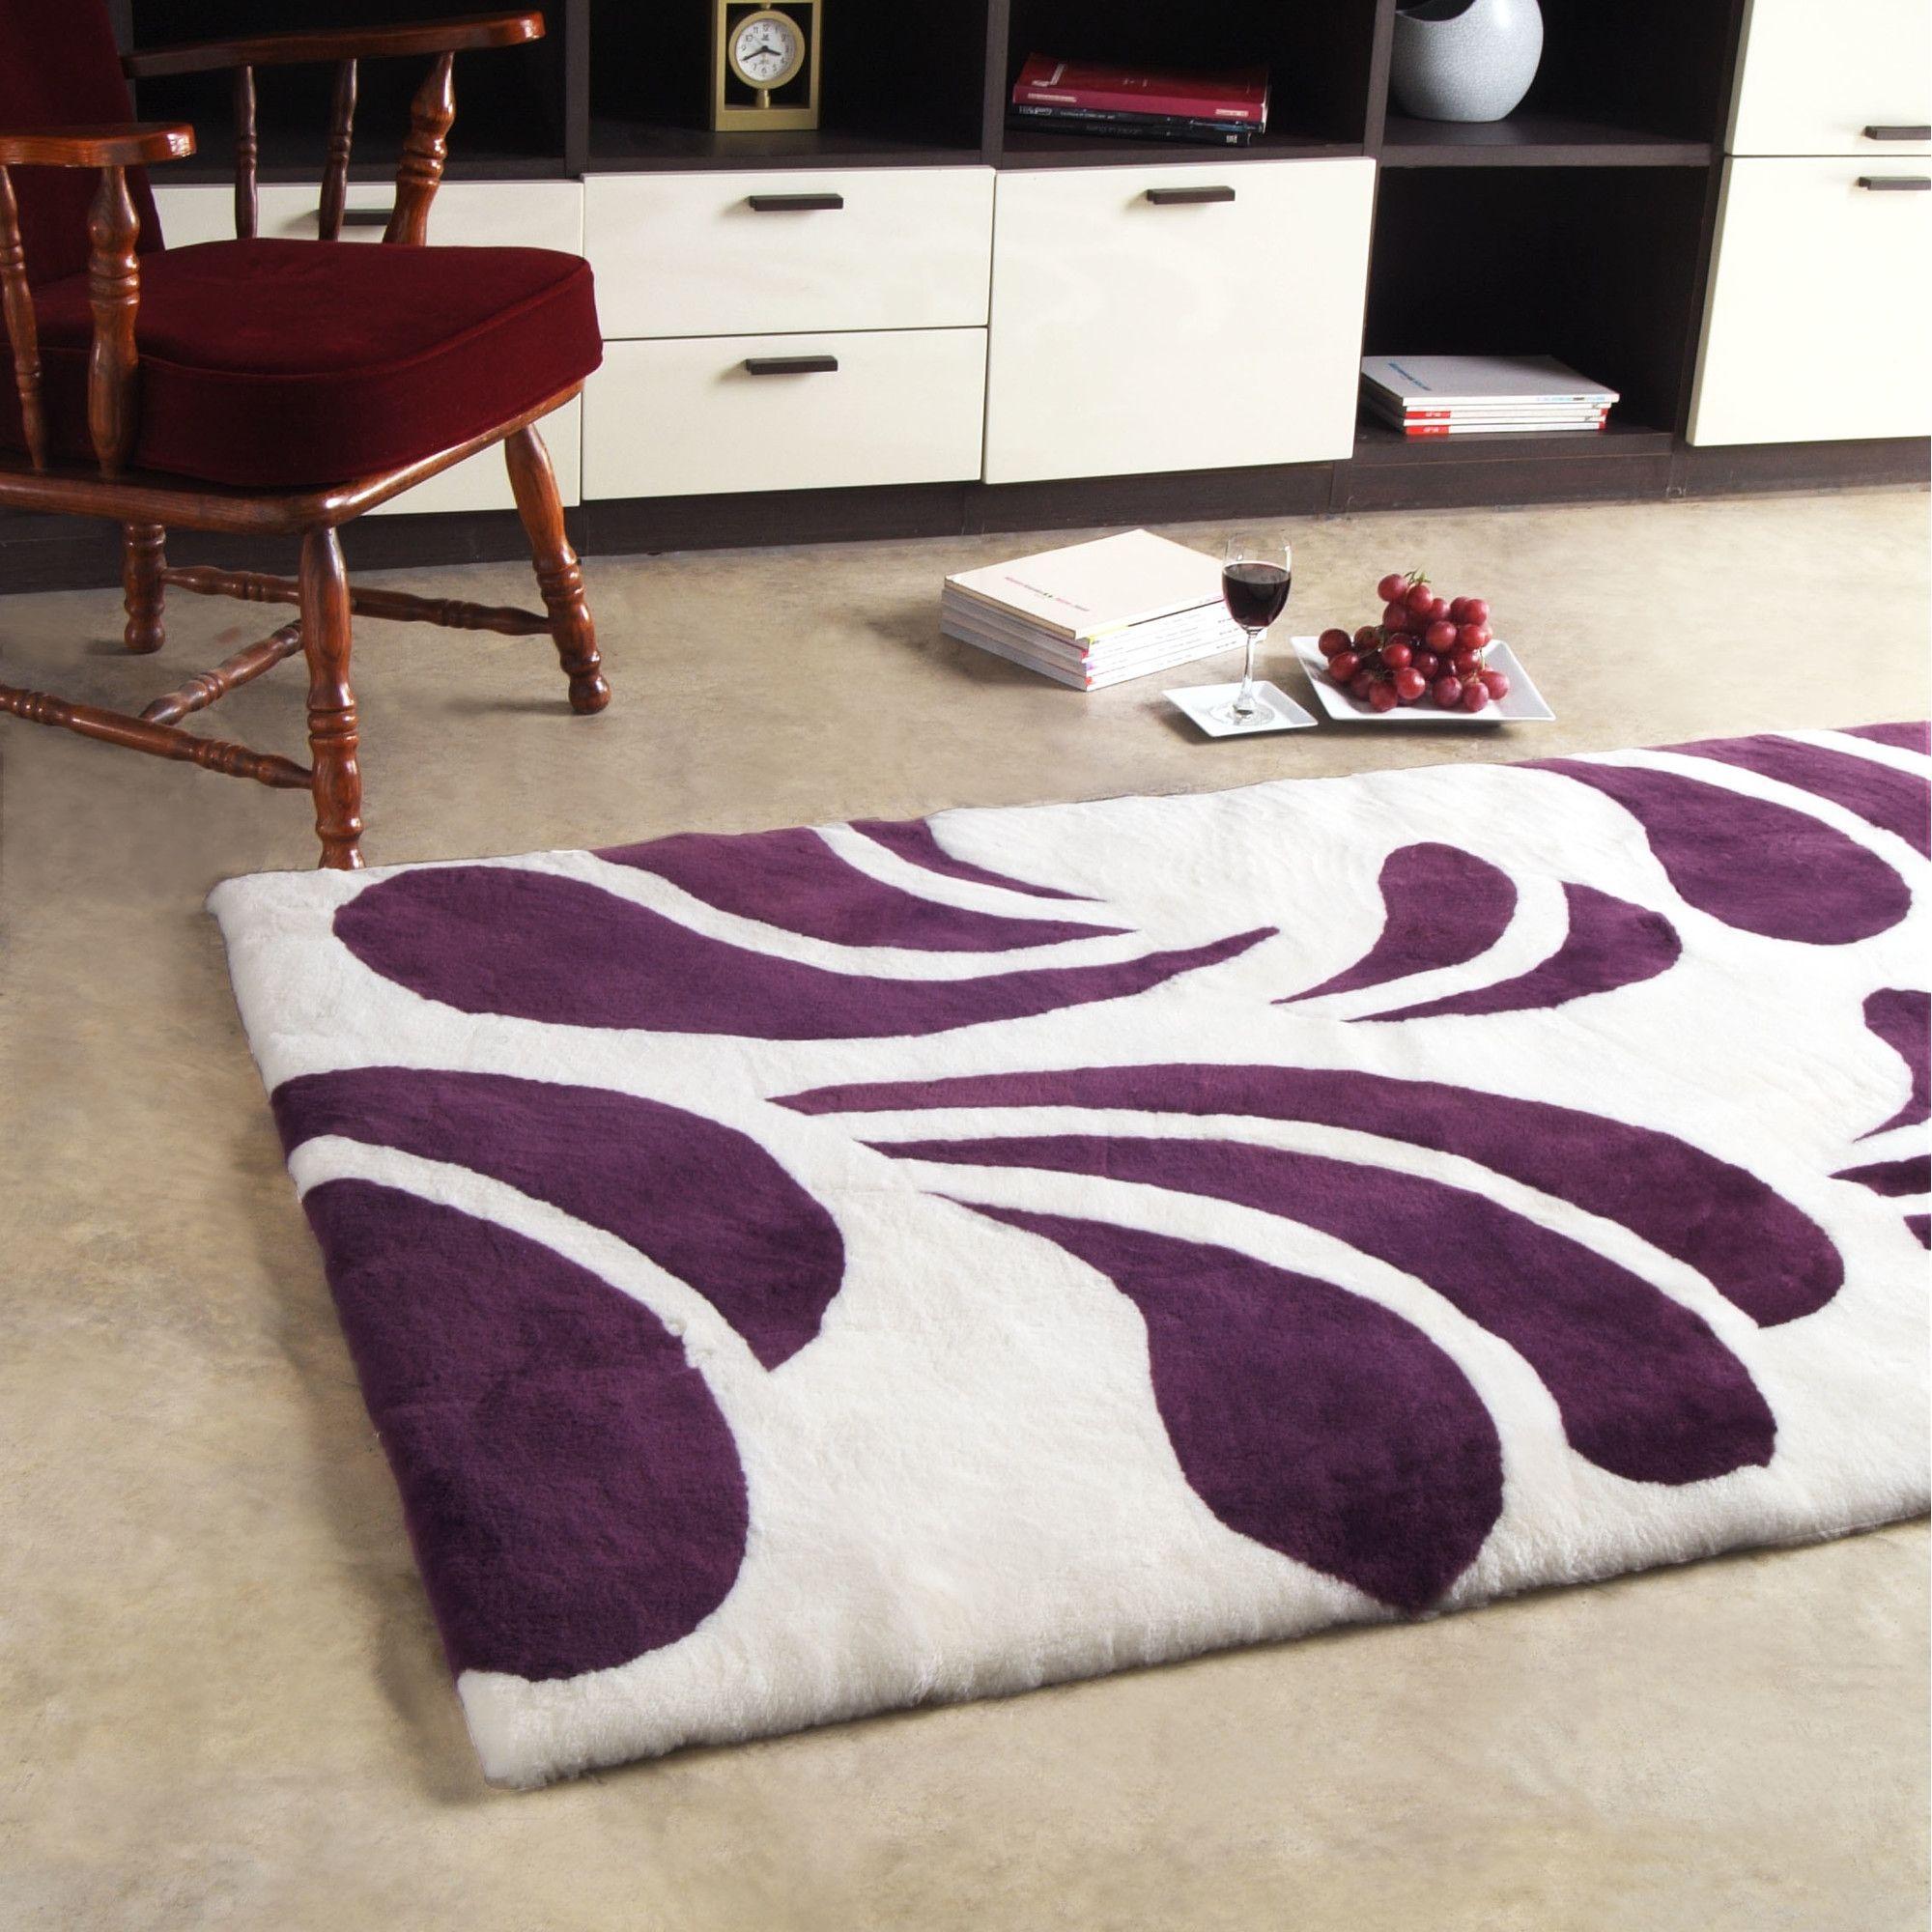 Bowron Sheepskin Shortwool Design Baroque Number 3 Cherry Rug - 240cm H x 170cm W x 1cm D